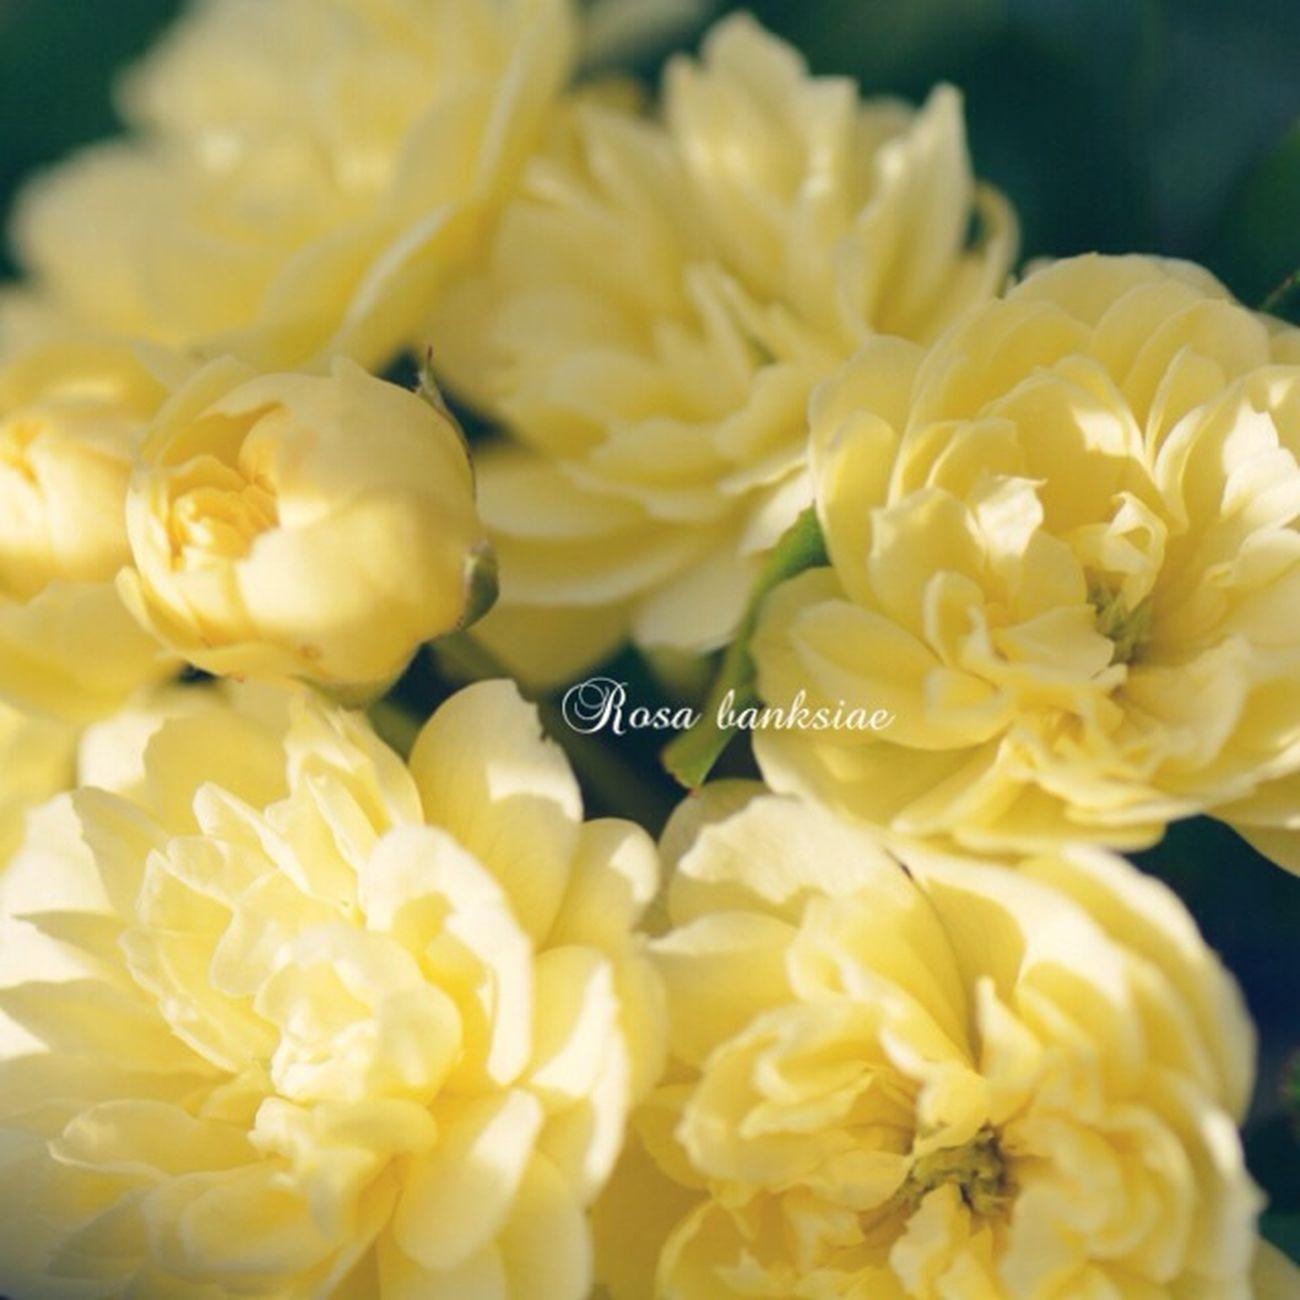 Japan EyeEm 2015 TAMROM Nikon D5200 庭に咲く花 Flower 花 Cute Happy Roses